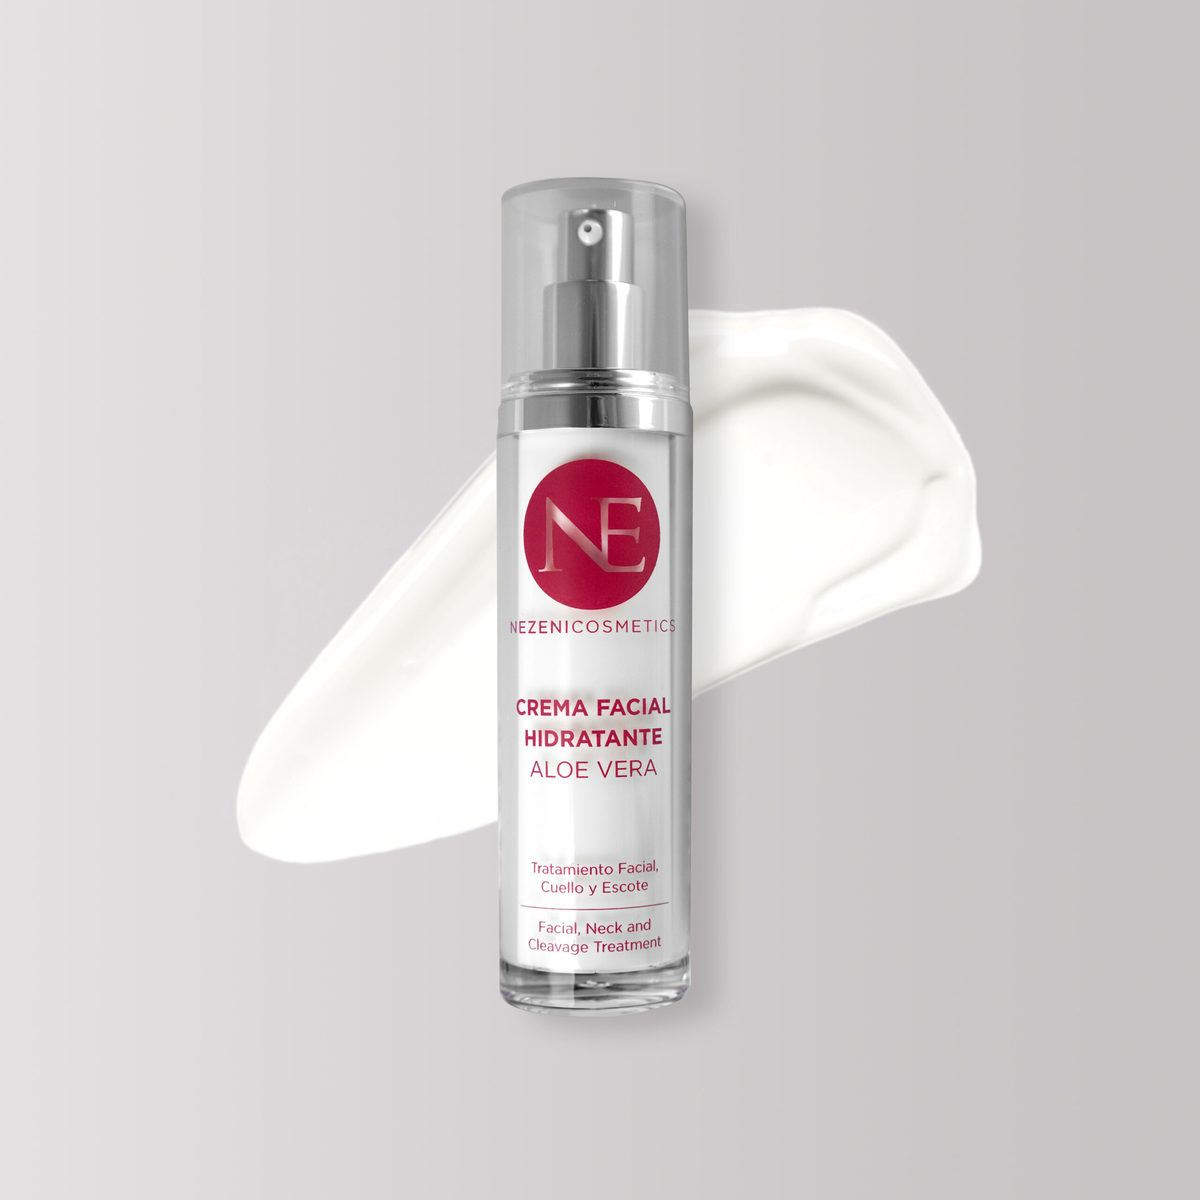 Crema facial hidratante de áloe vera de Nezeni Cosmetics